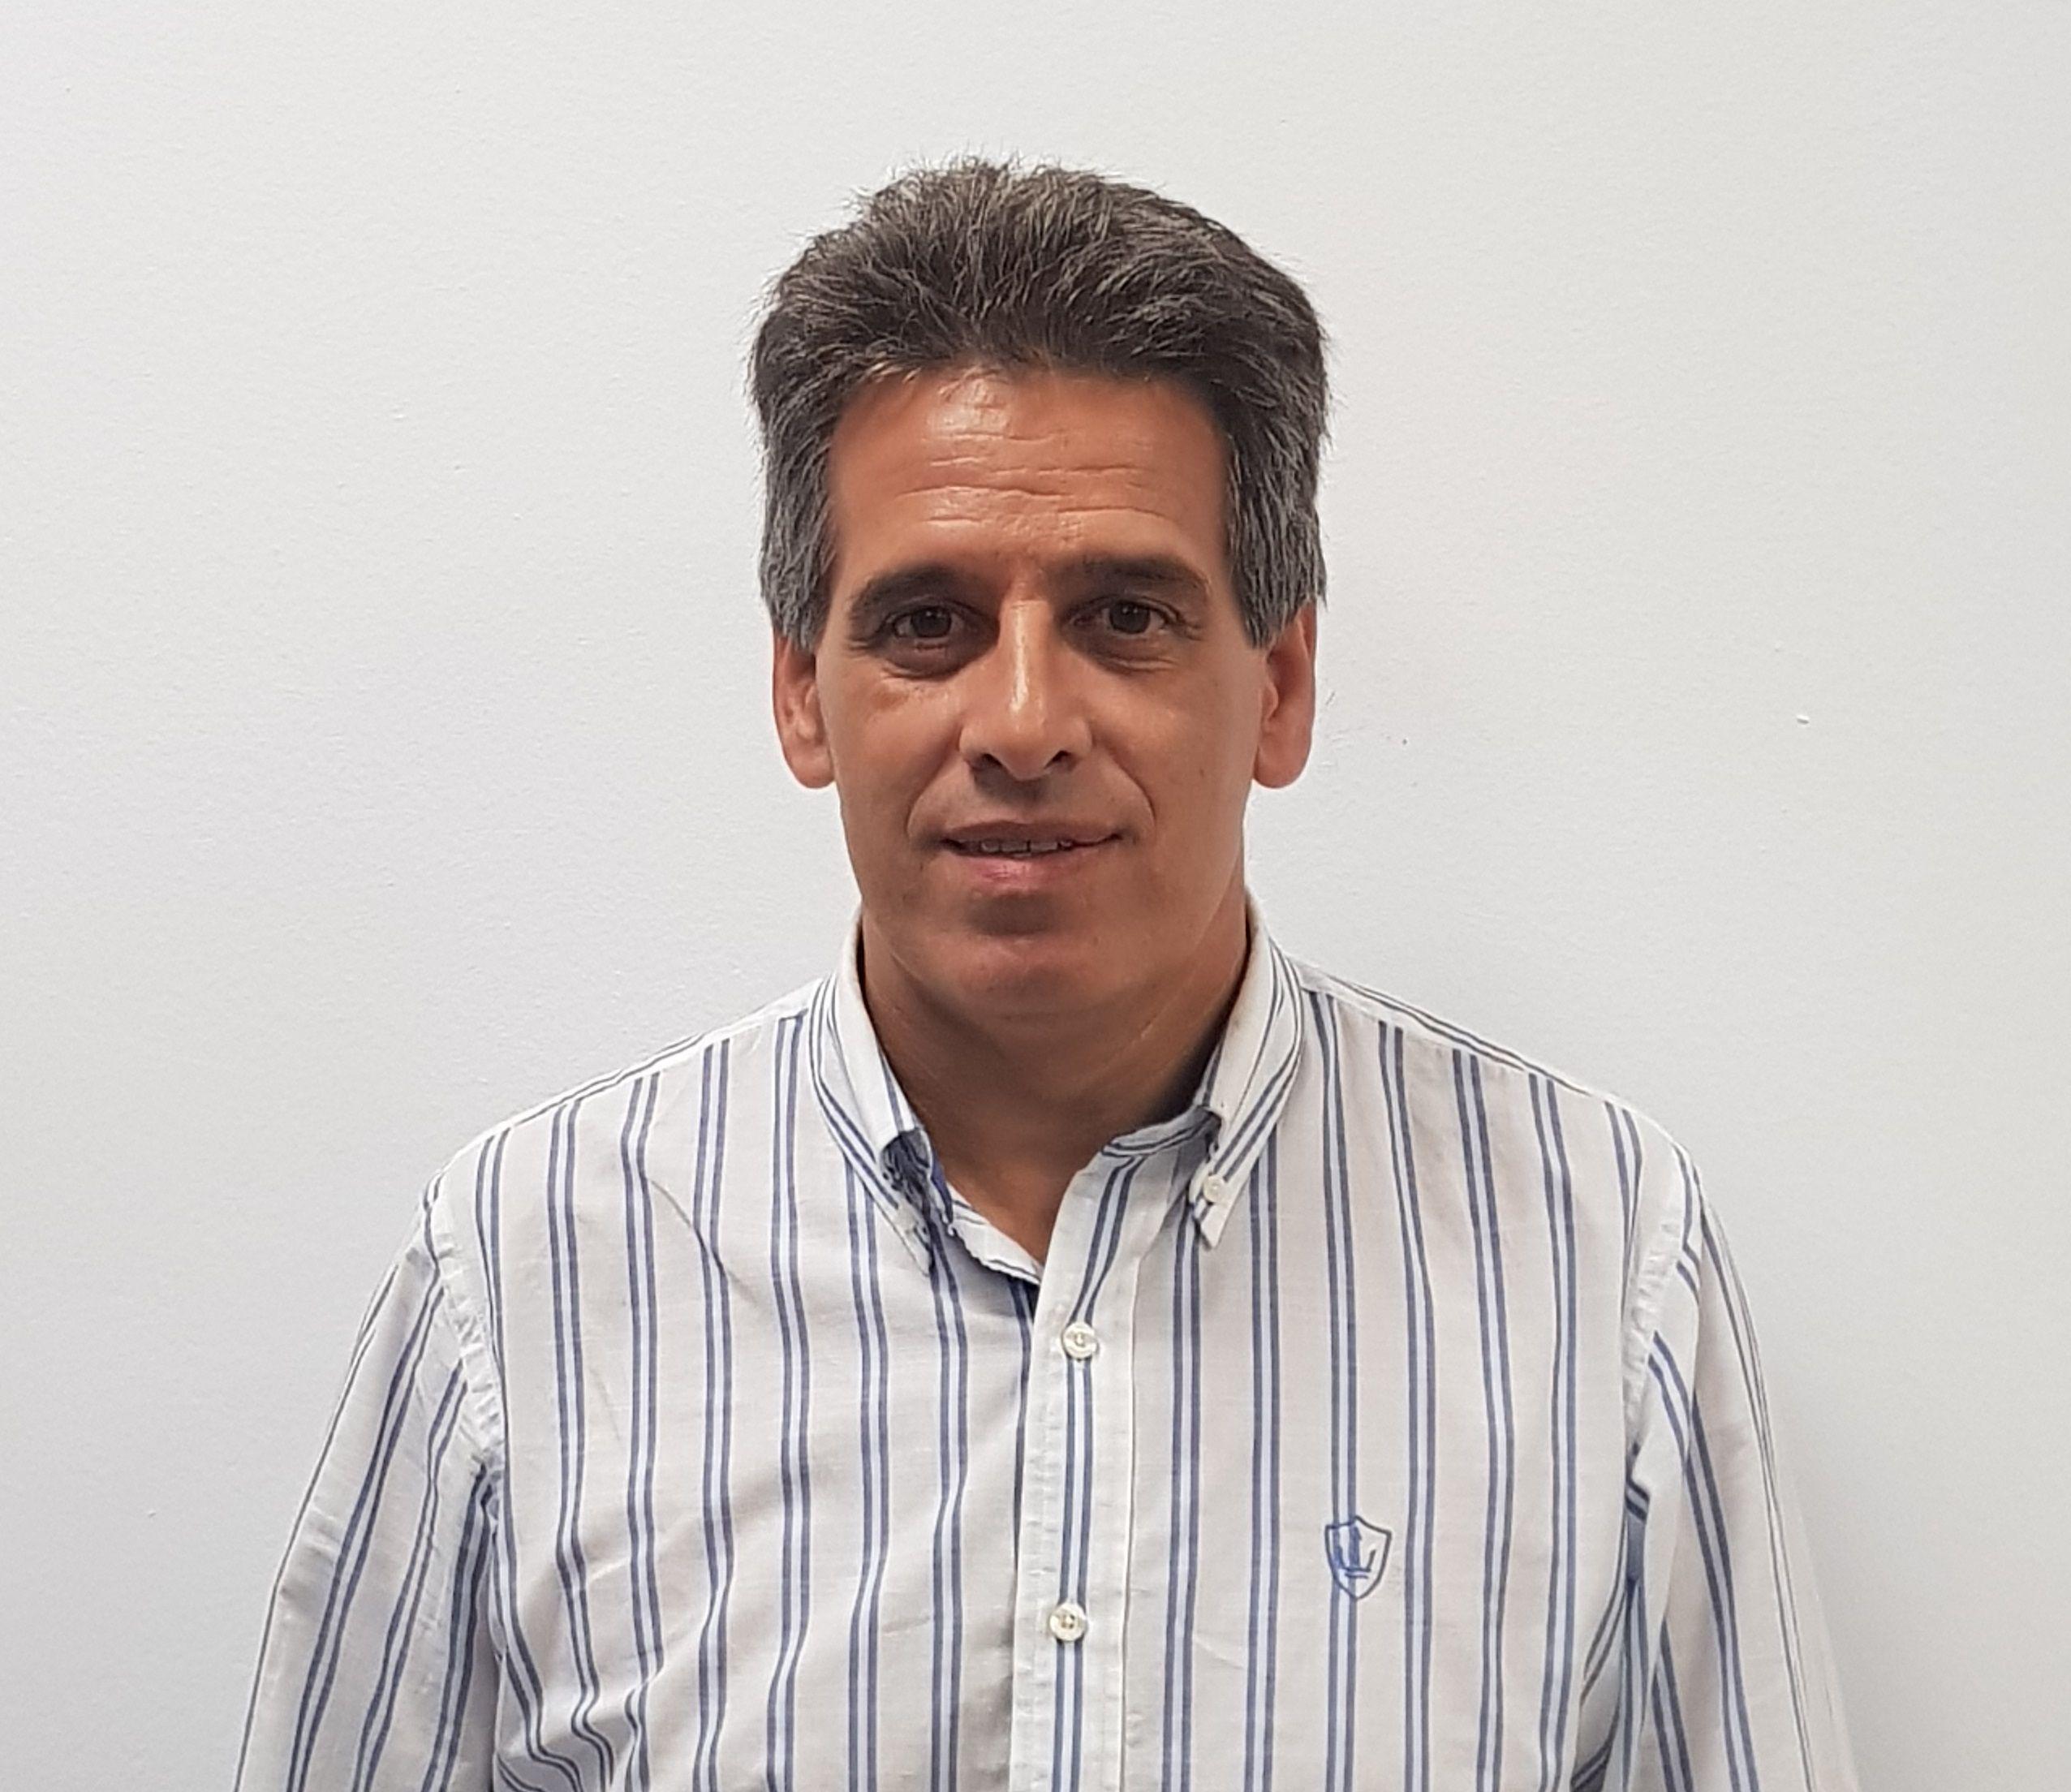 Alfons Miras Casasayas